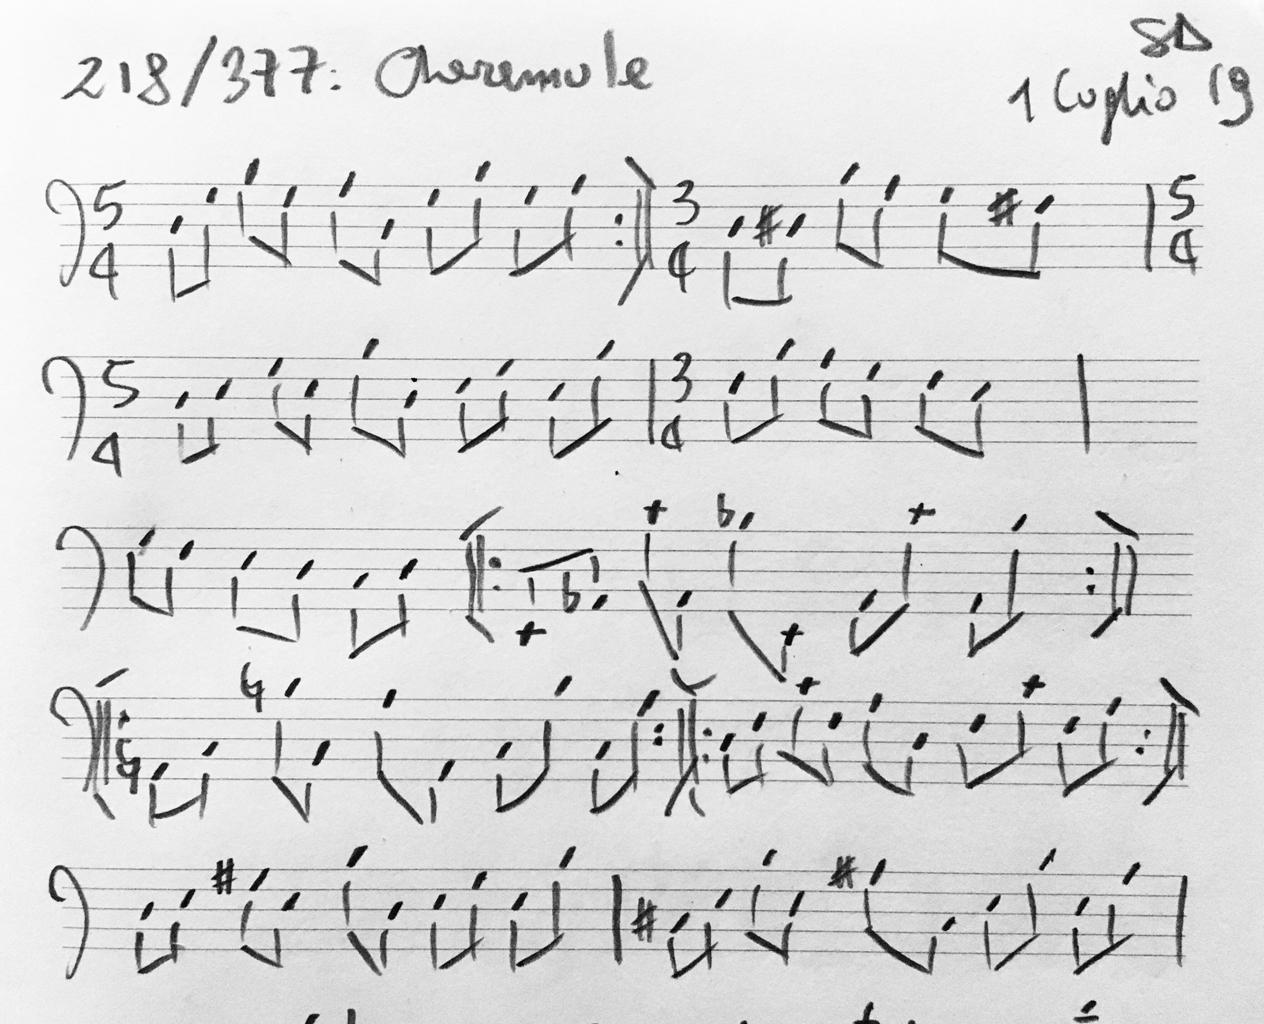 218-Cheremule-score